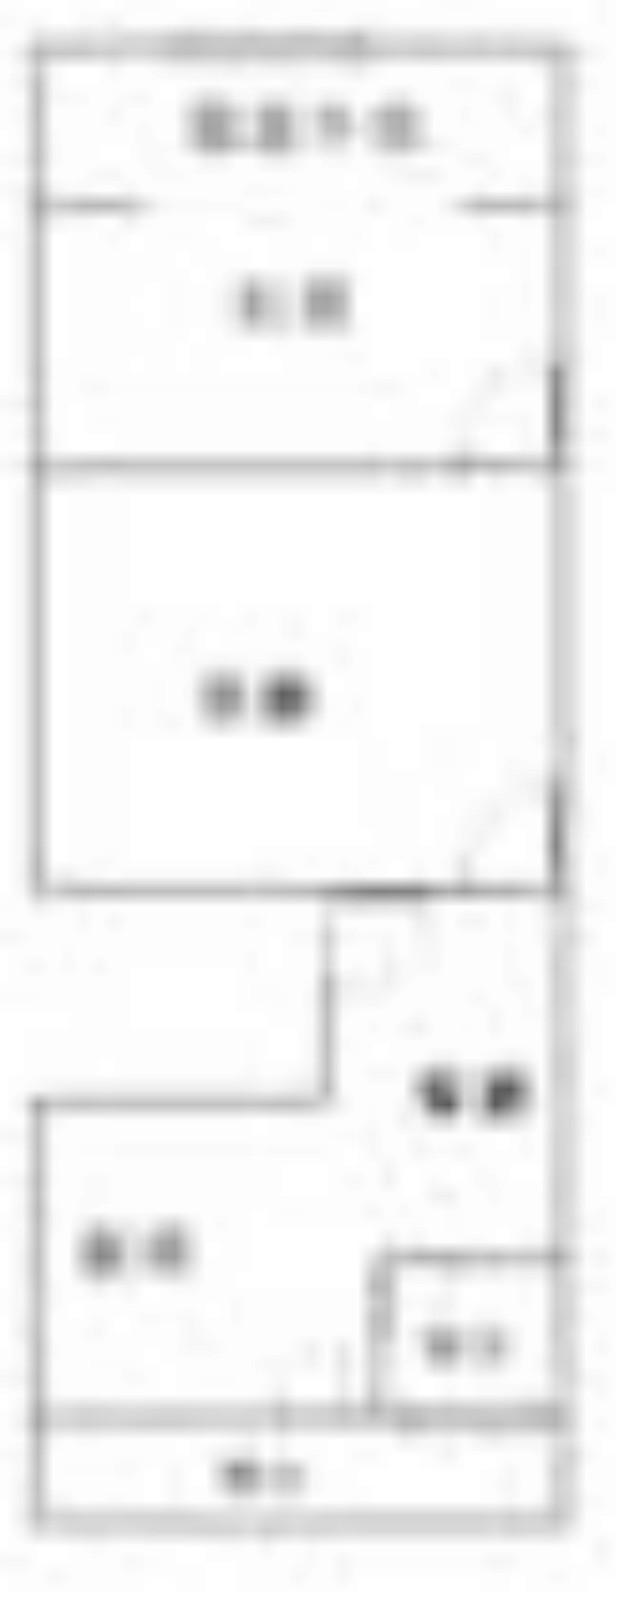 System.Web.UI.WebControls.Label,台北市中山區民權東路一段